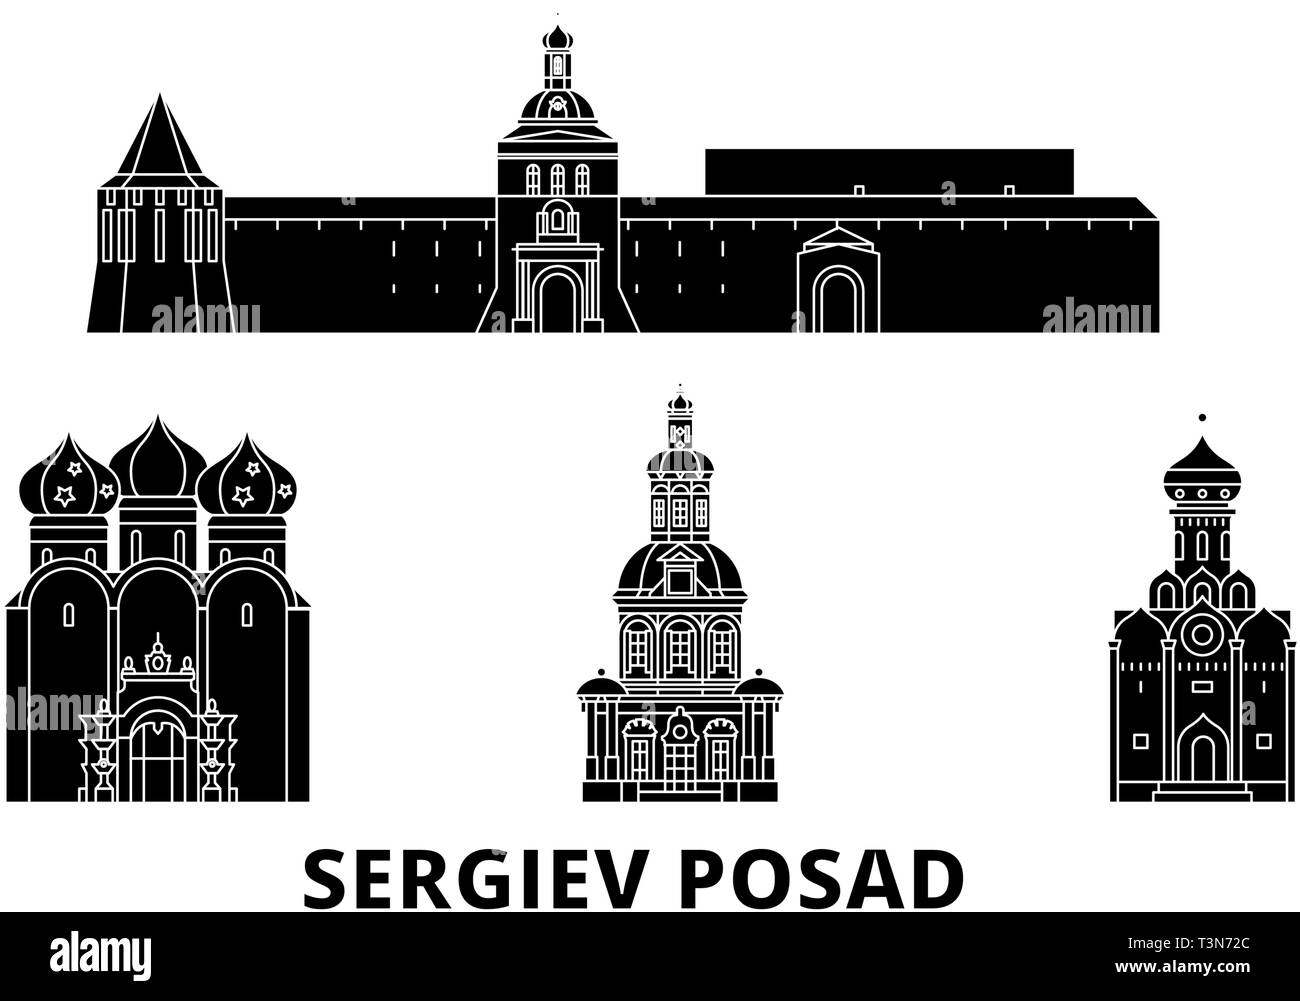 Russia, Sergiev Posad flat travel skyline set. Russia, Sergiev Posad black city vector illustration, symbol, travel sights, landmarks. - Stock Image